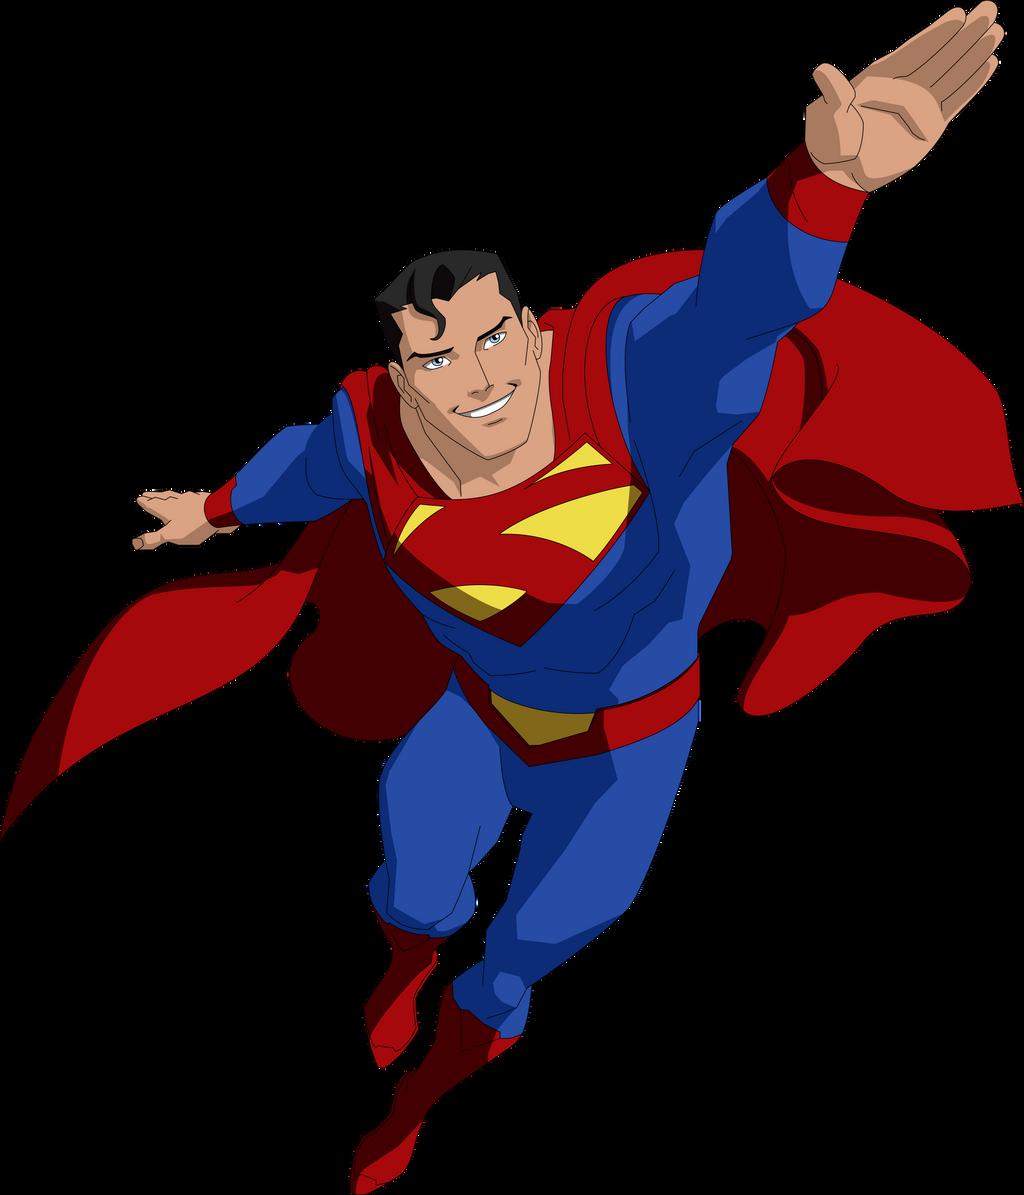 animated superman clipart - photo #40